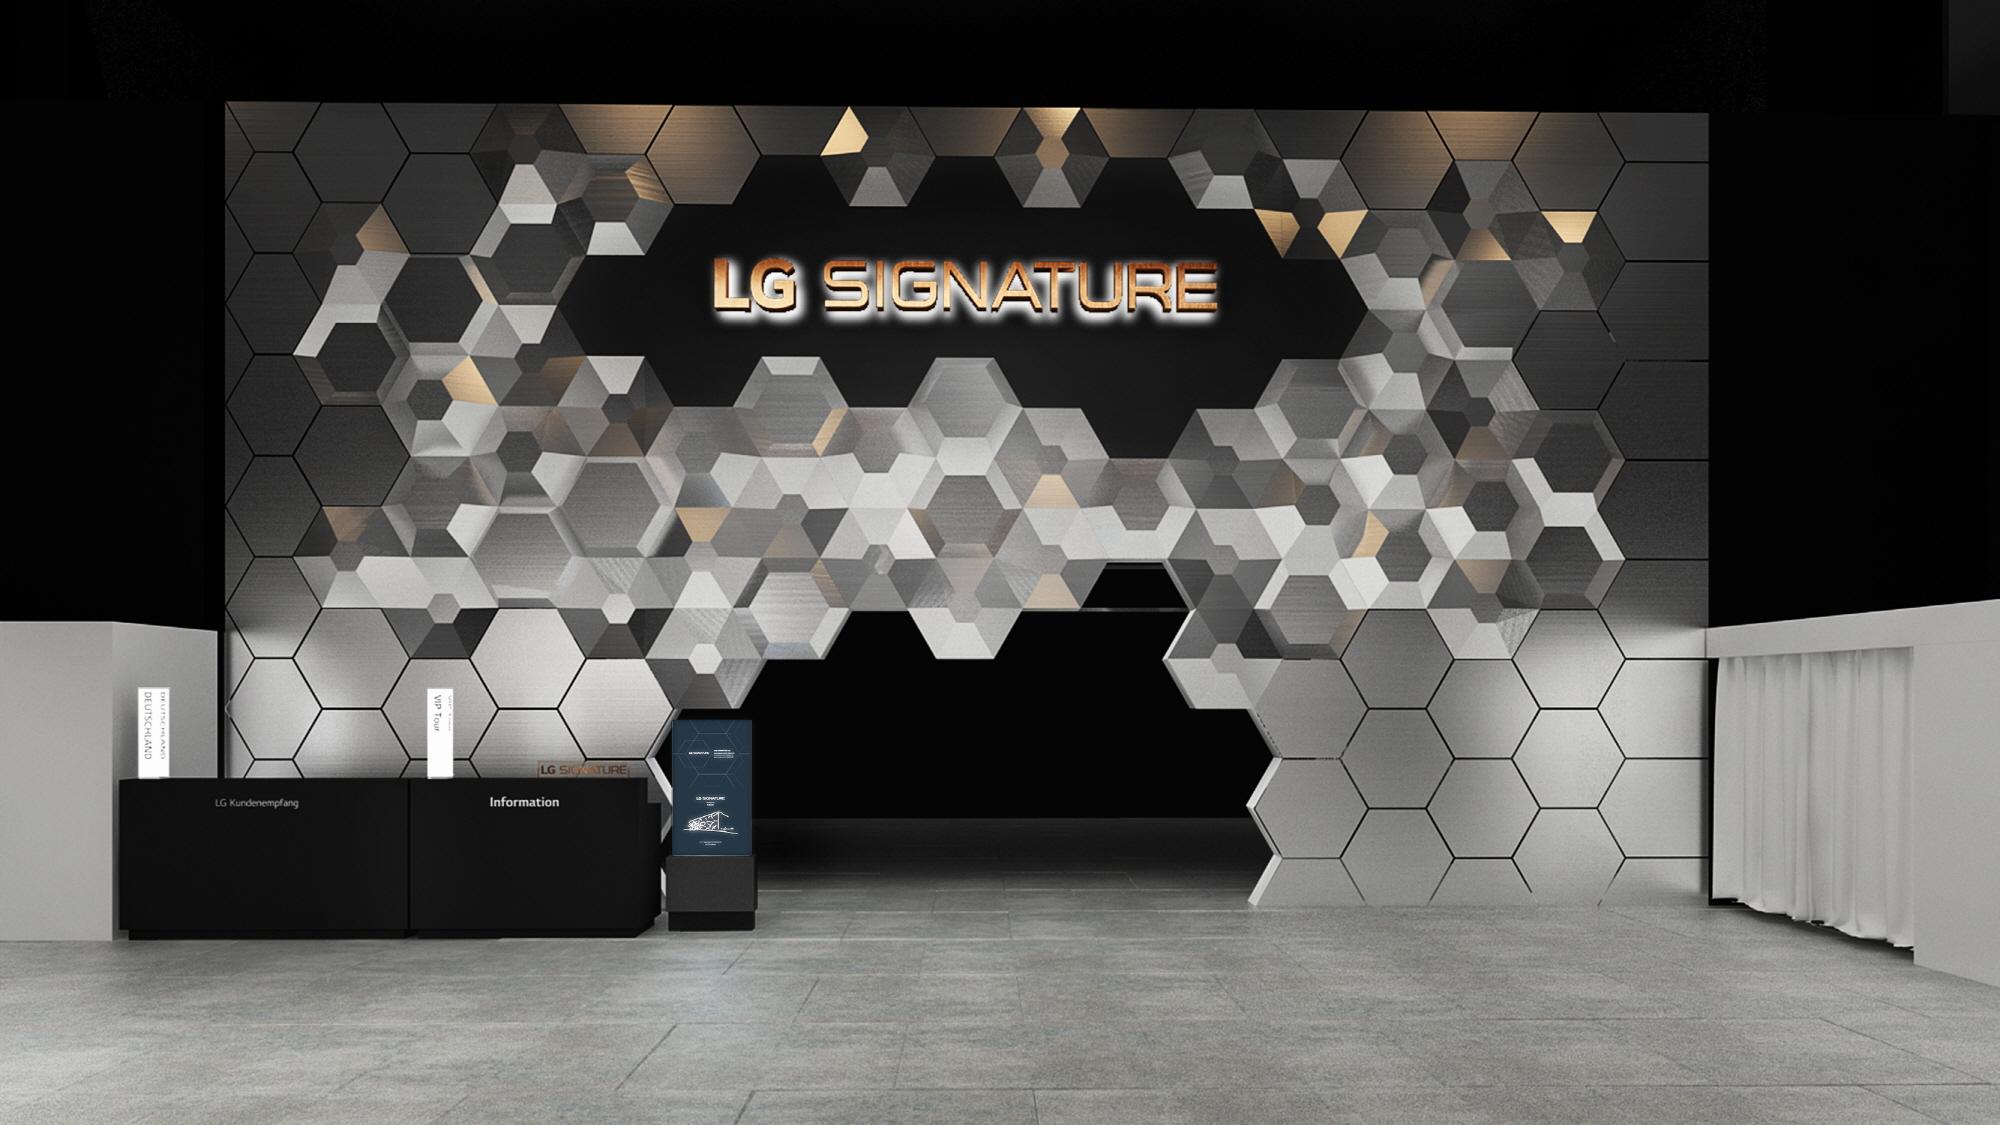 LG전자와 이탈리아 유명 건축가 '마시밀리아노 푹사스'가 다음 달 독일 베를린에서 열리는 IFA 2019에서 선보일 LG 시그니처 부스의 컨셉 이미지